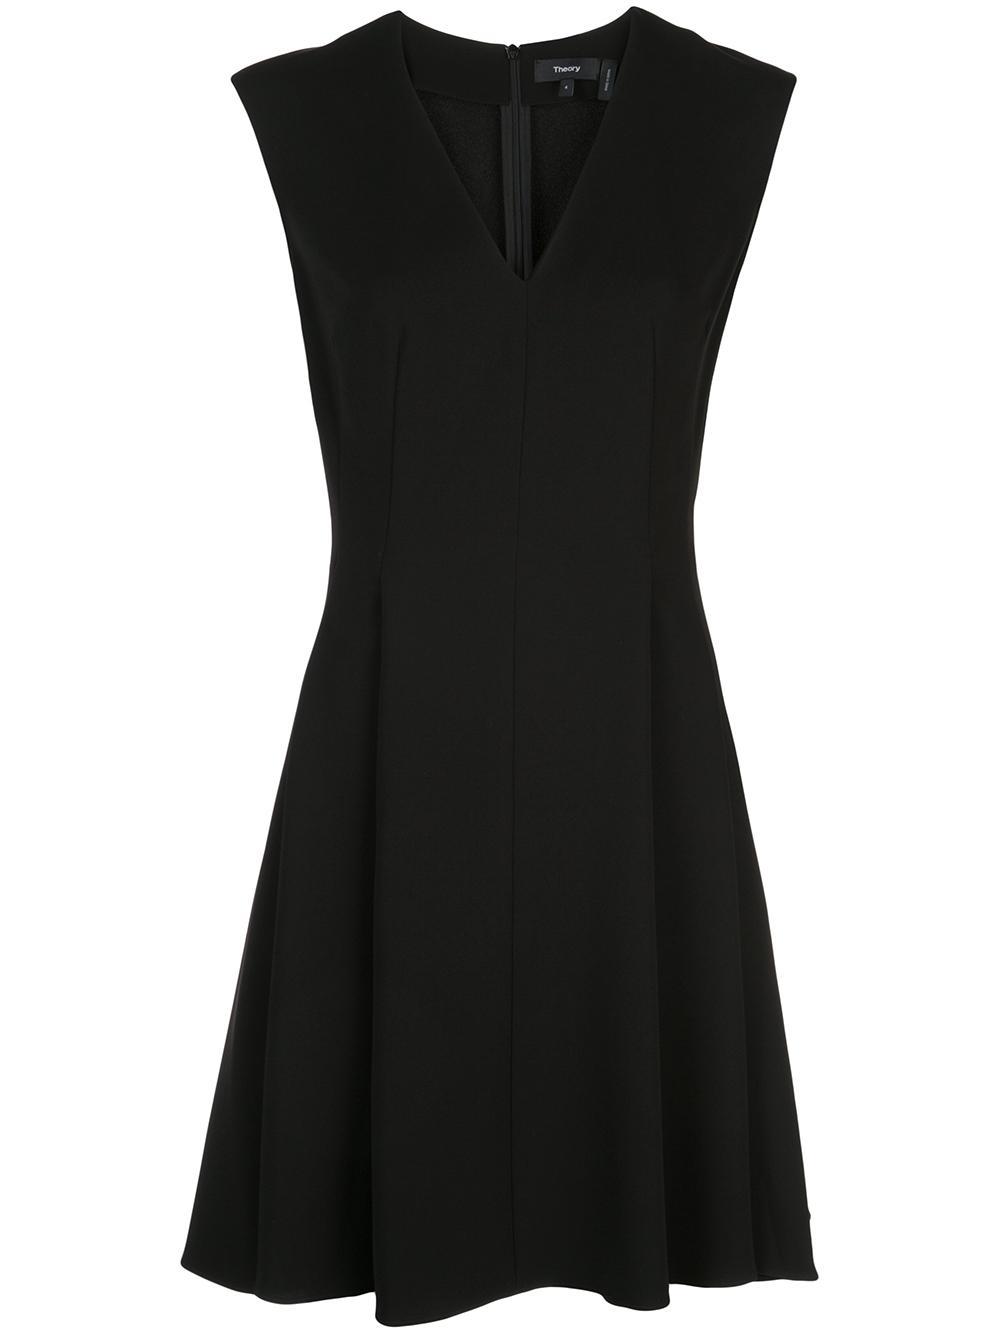 Classic Pleated Cap Sleeve Dress